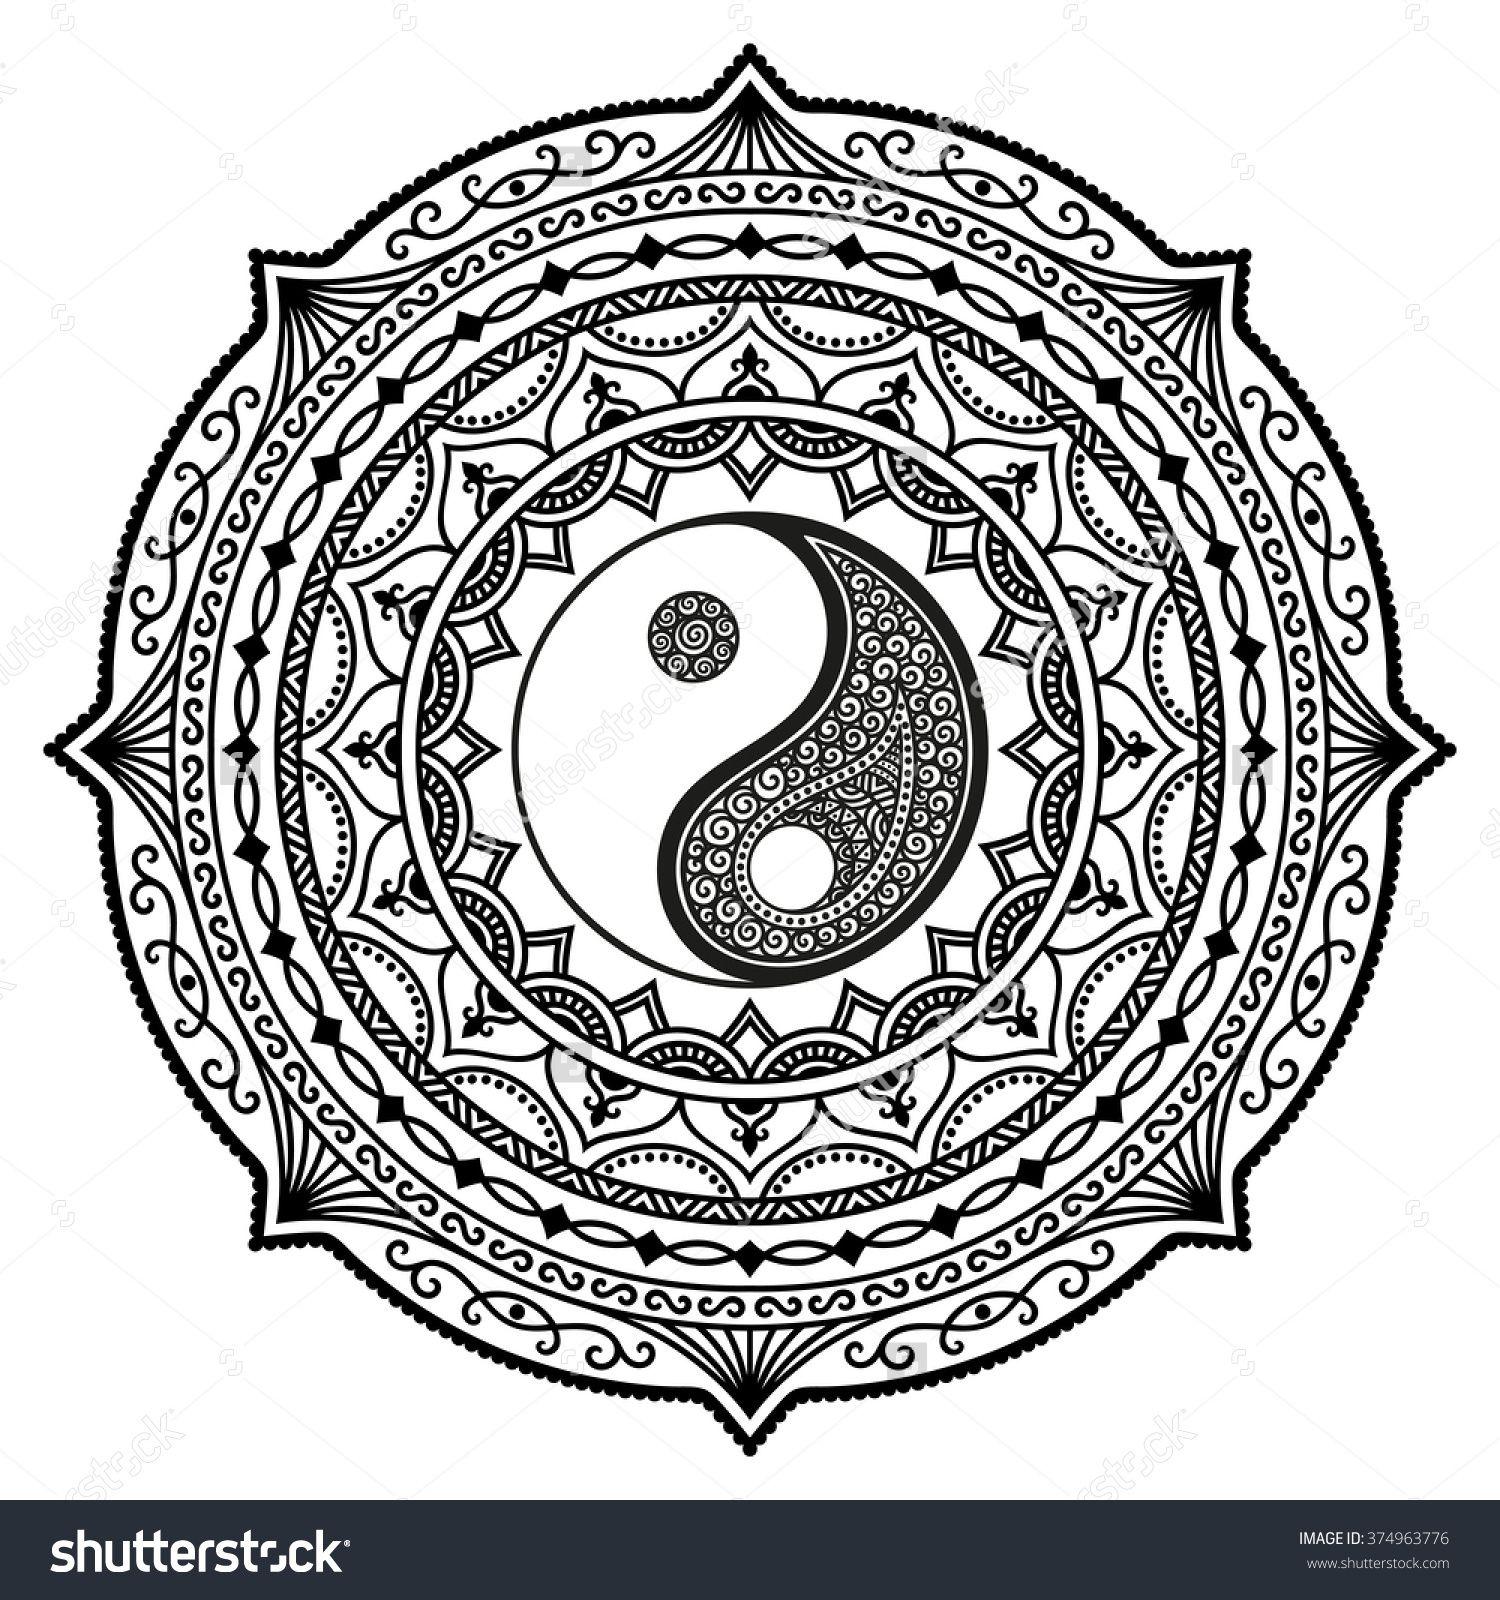 Stock Vector Vector Henna Tatoo Mandala Yin Yang Decorative Symbol Mehndi Style 374963776 Jpg 1500 1600 Nebolshie Zhenskie Tatuirovki In Yan Raskraski